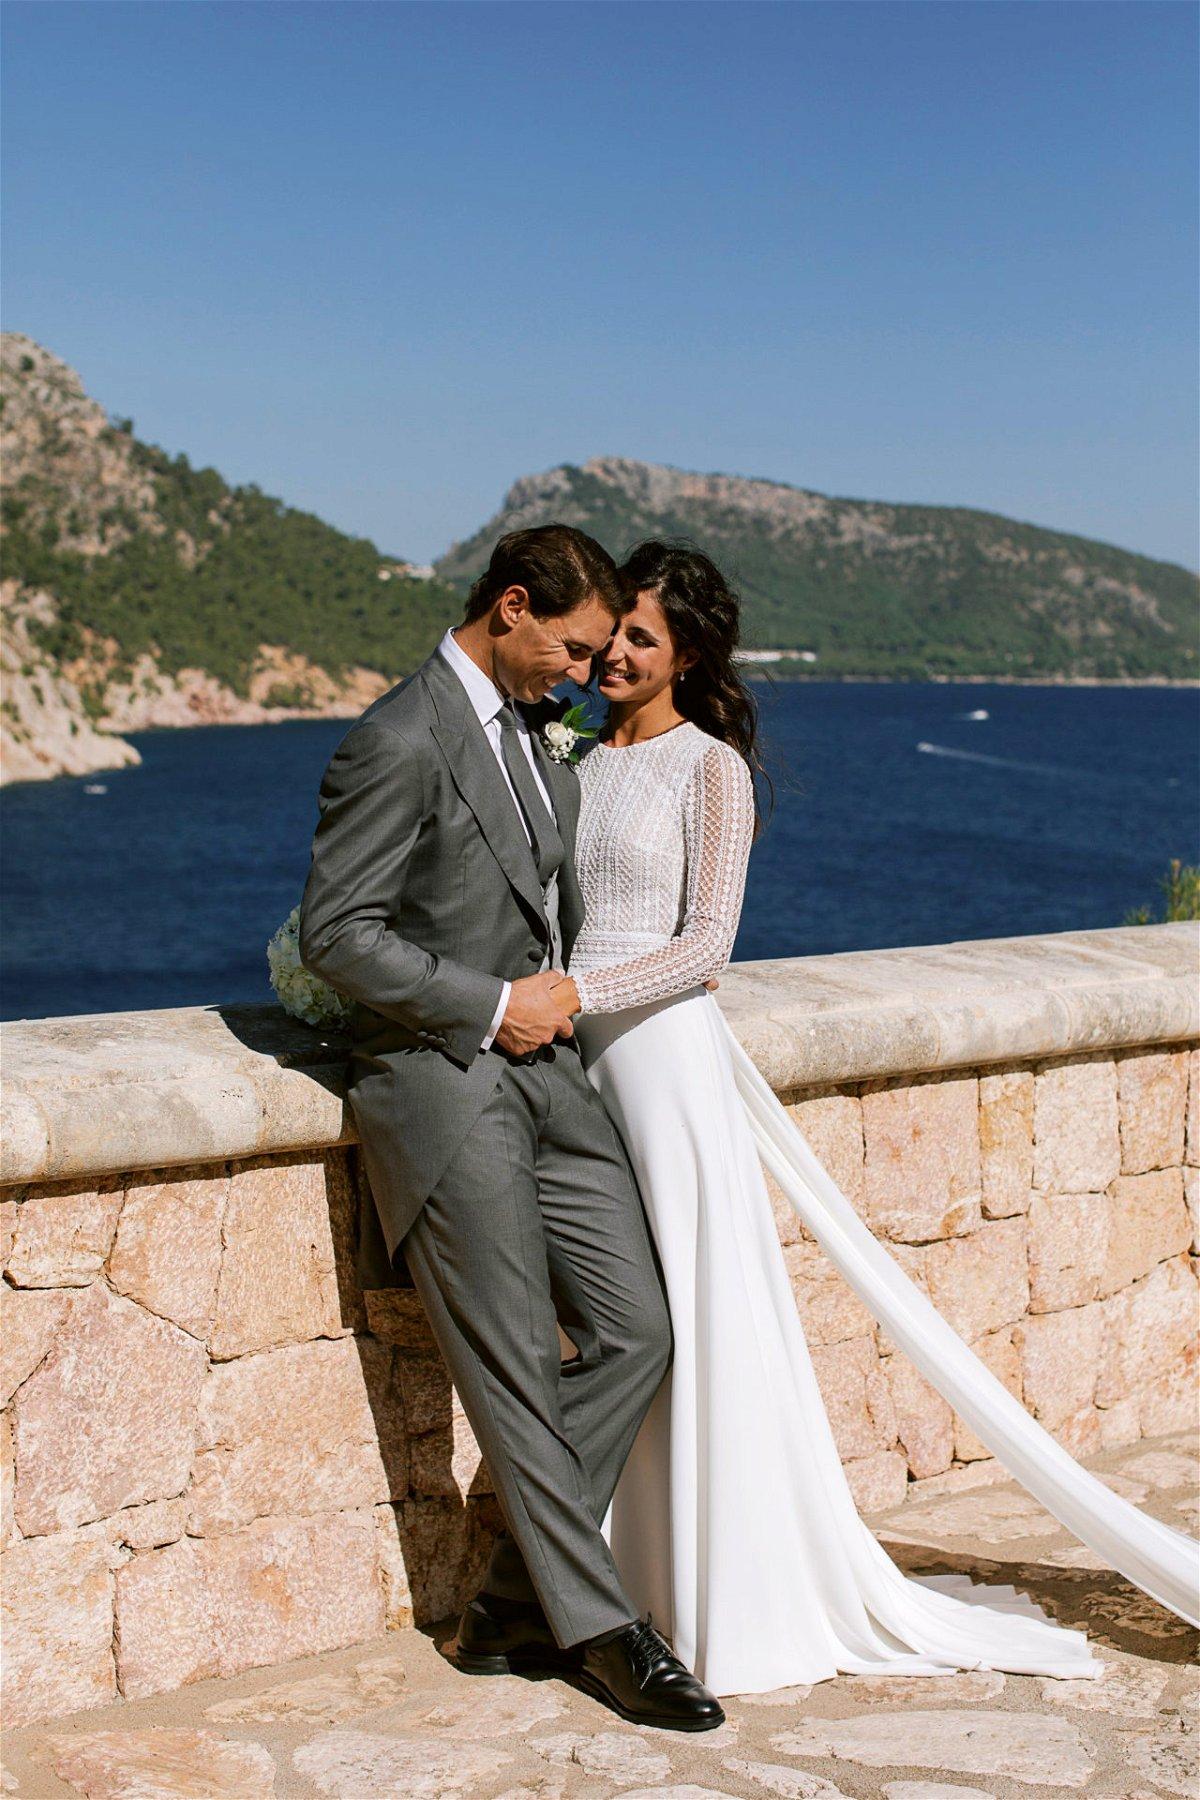 Rafael Nadal with wife Maria Perello